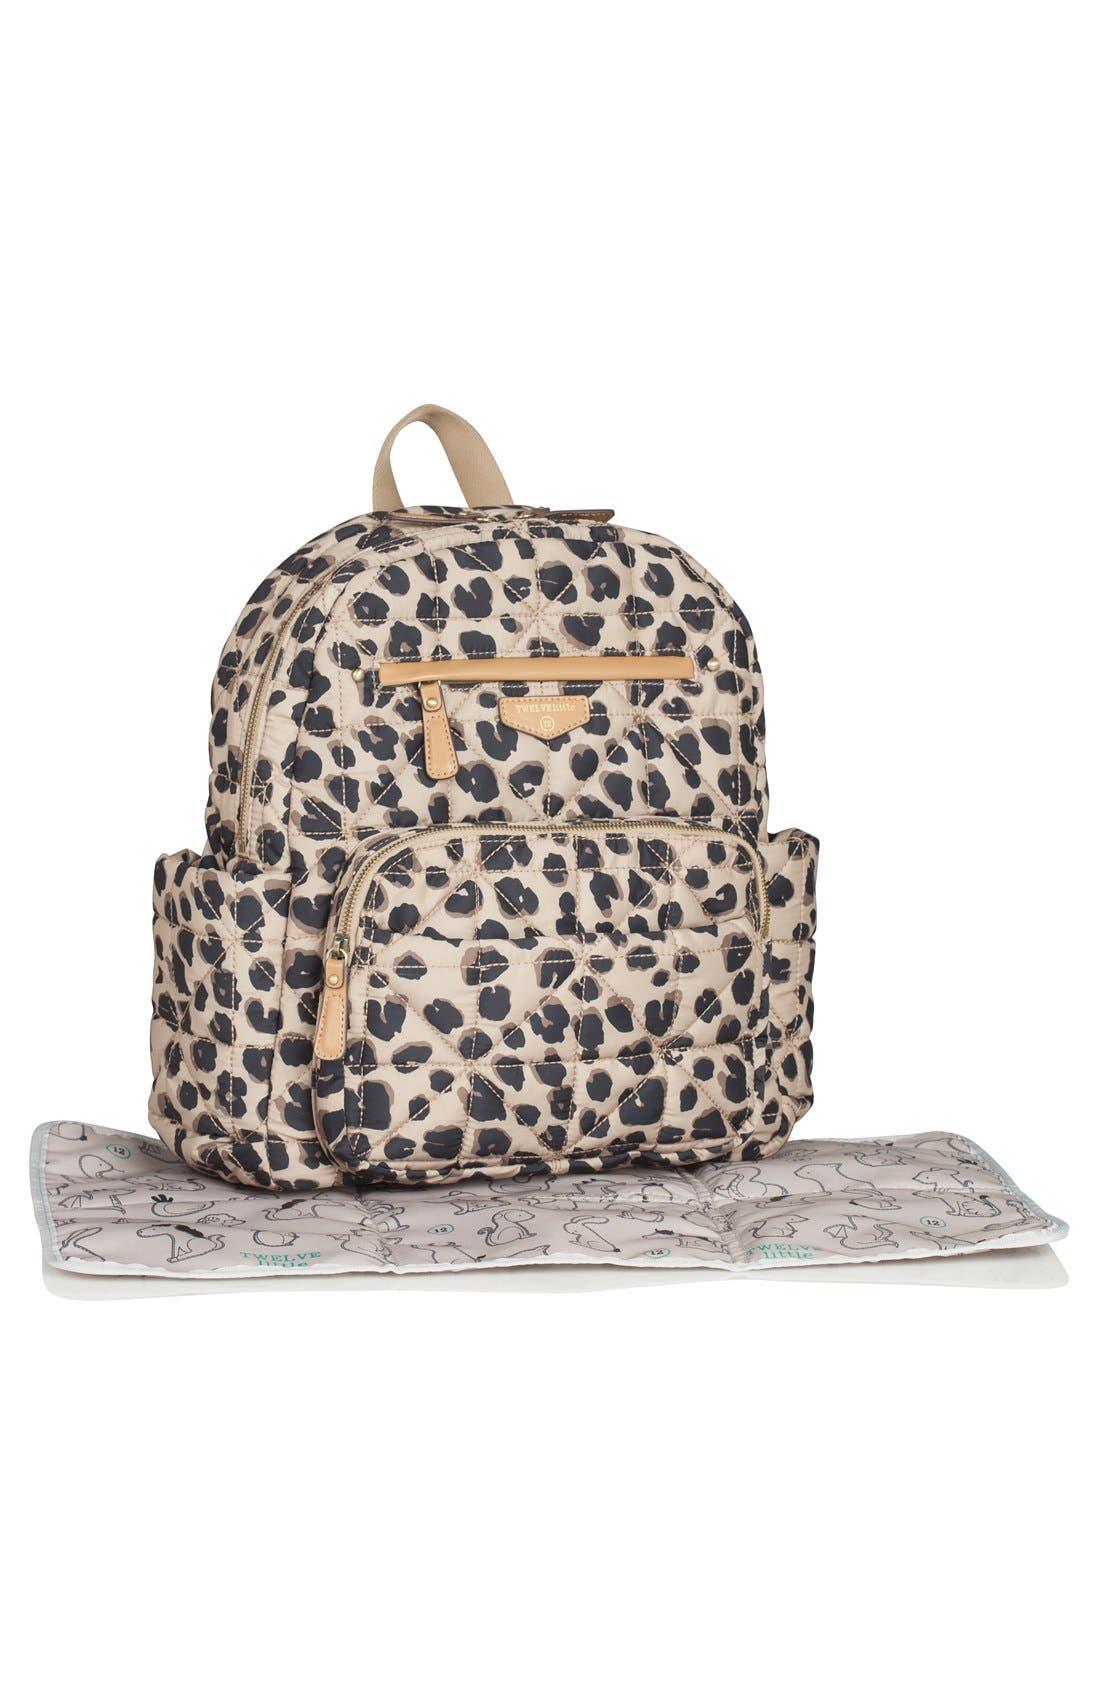 TWELVELITTLE, Quilted Water Resistant Nylon Diaper Backpack, Alternate thumbnail 5, color, LEOPARD PRINT